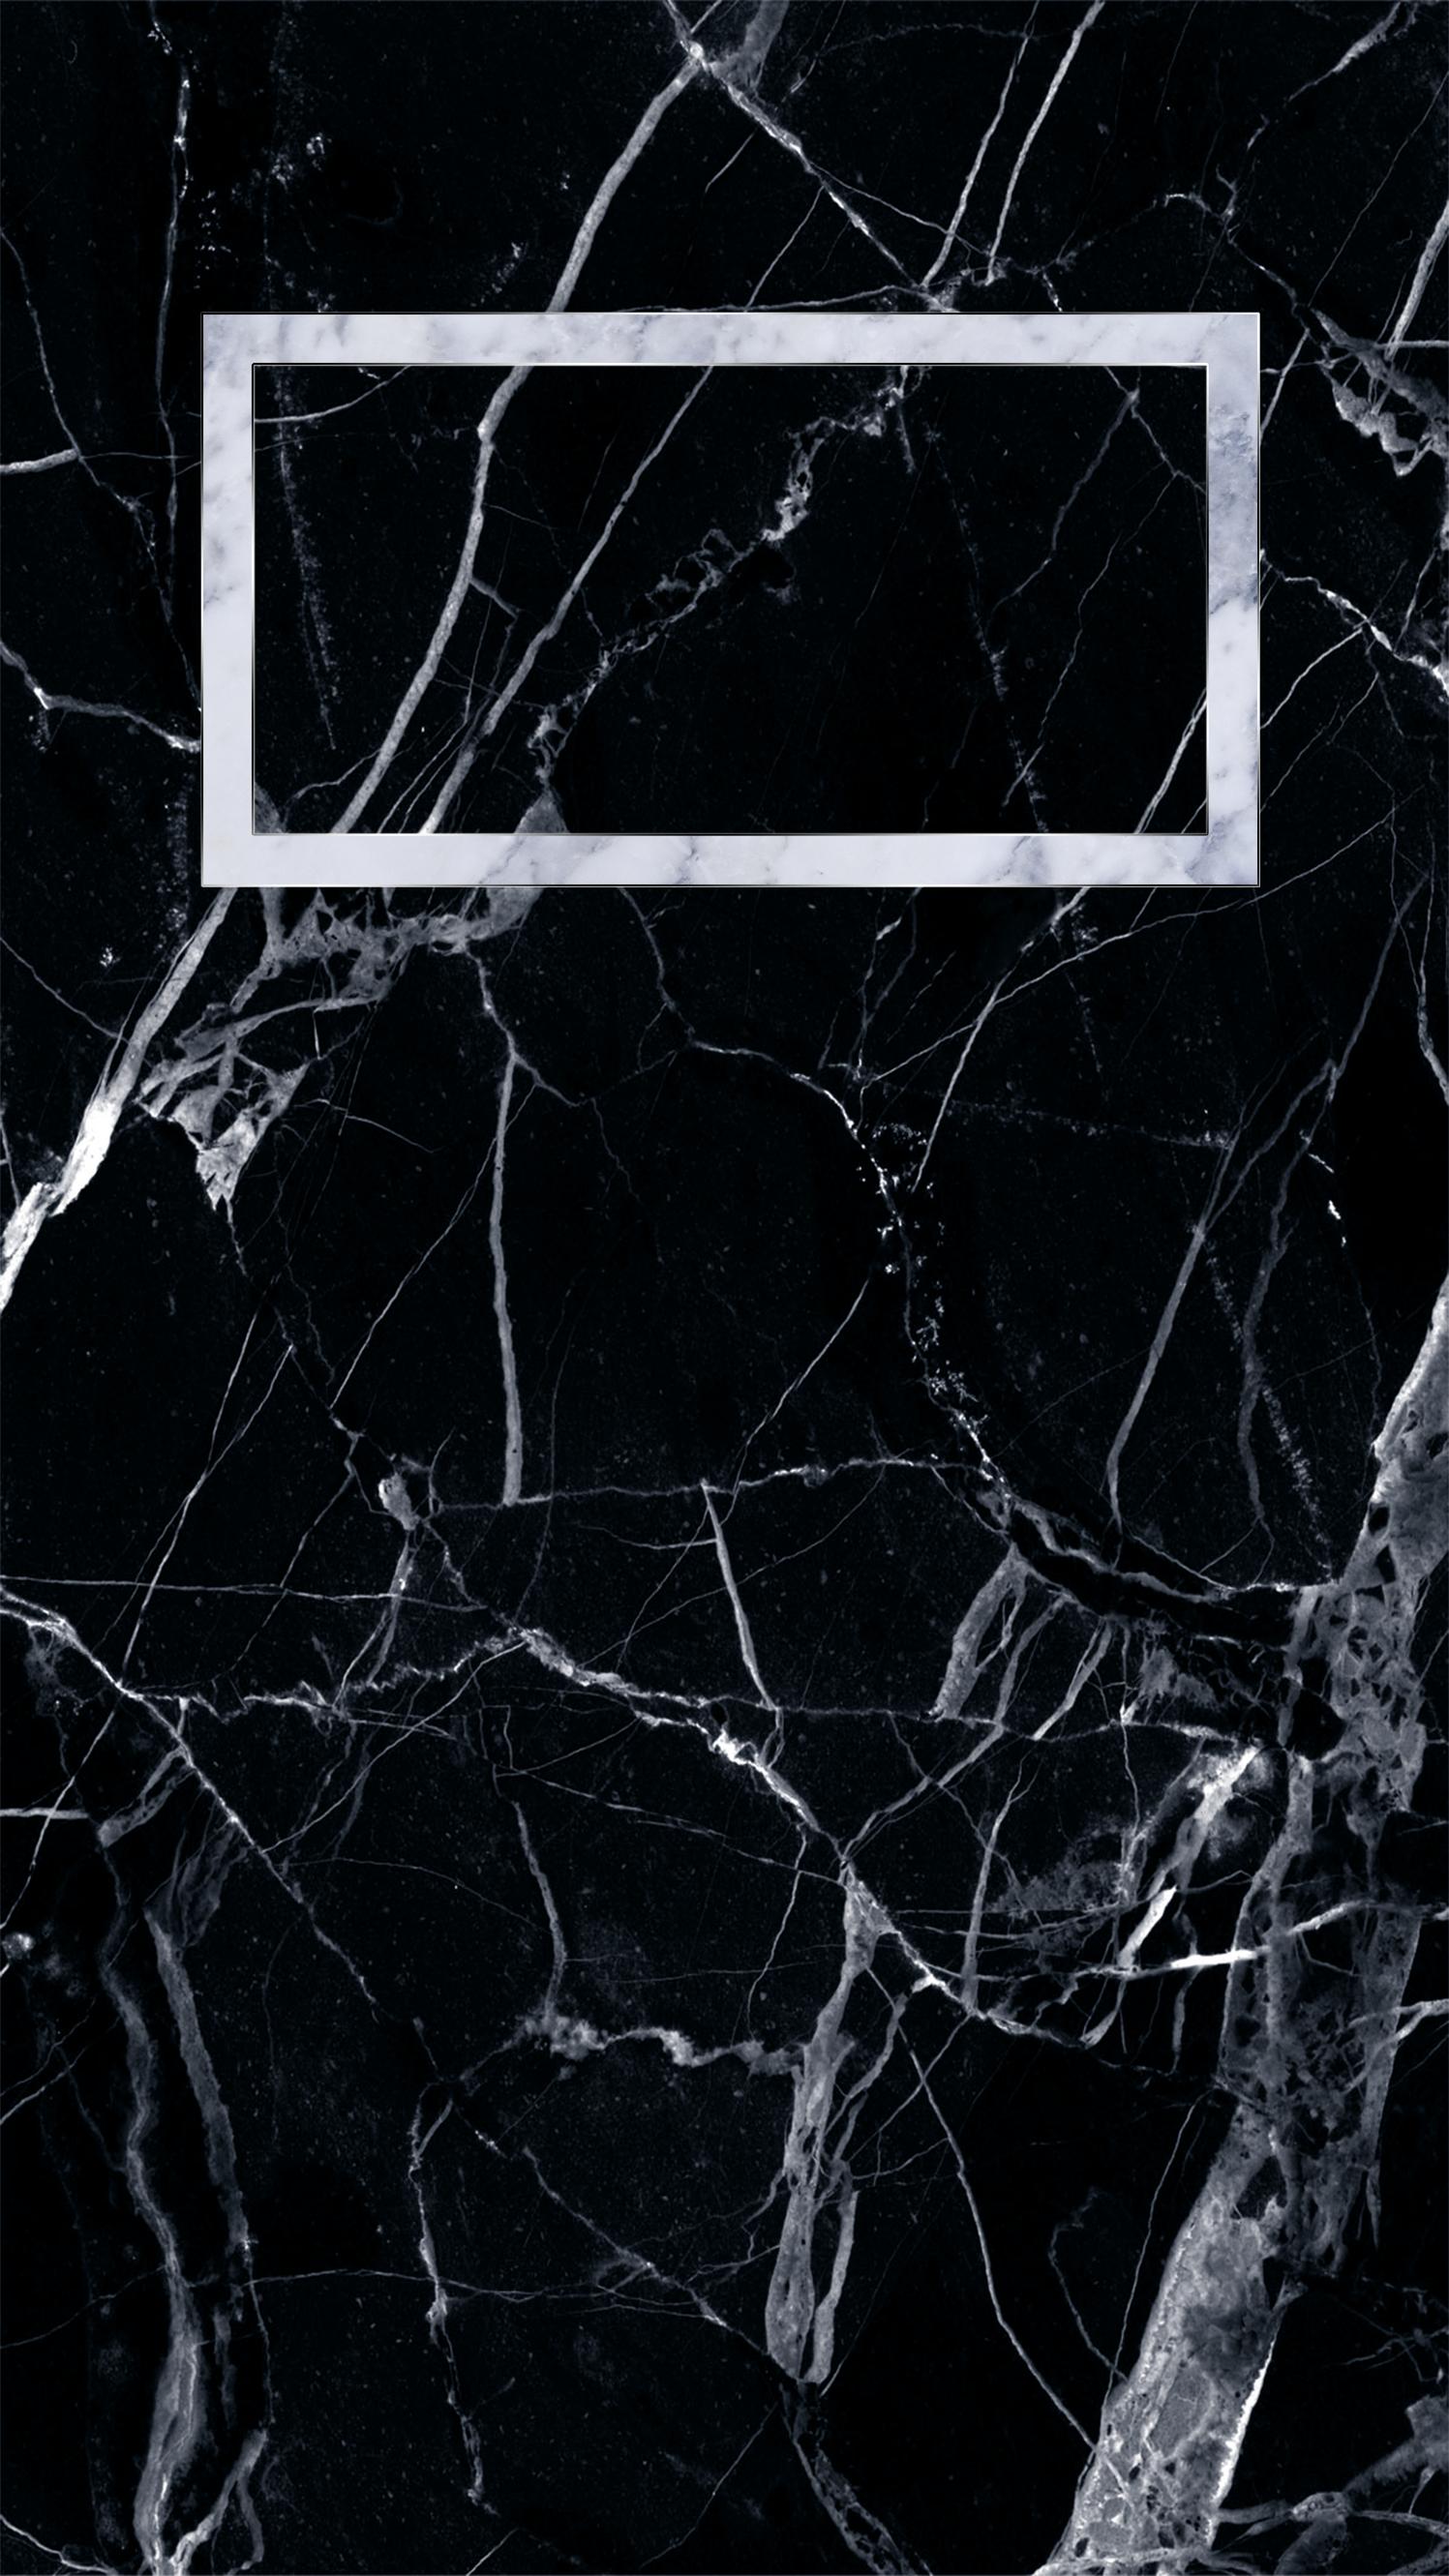 Space Gray Lock Screen By Jason Zigrino Iphone fondos de